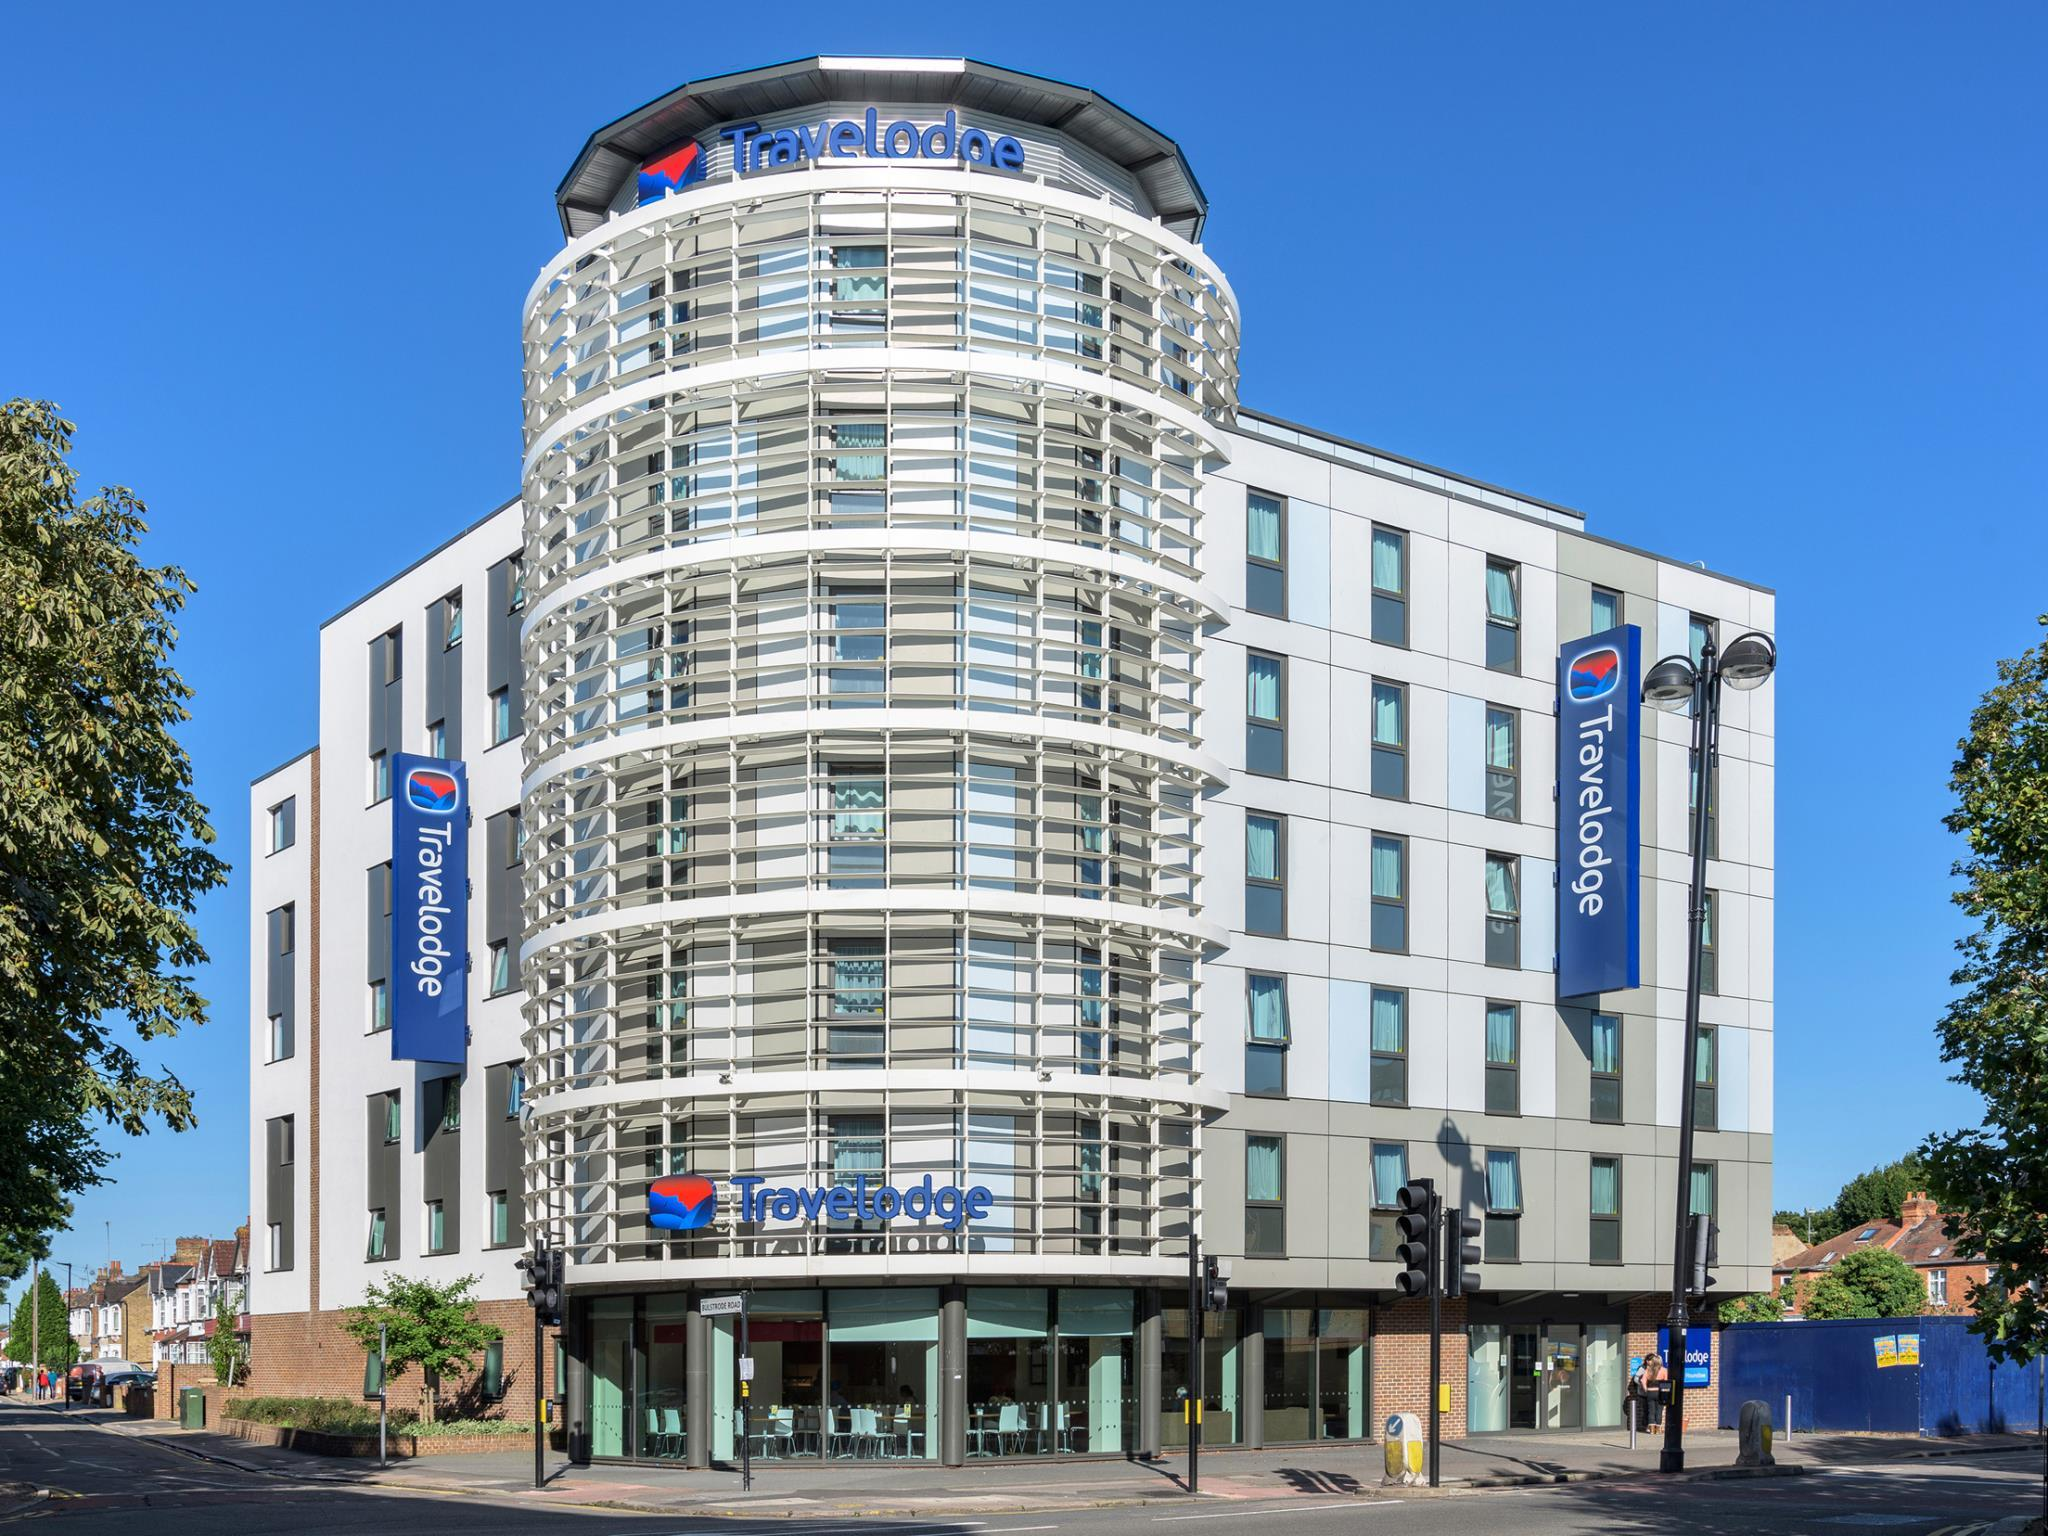 Travelodge London Hounslow Booking Agoda Com Best Price